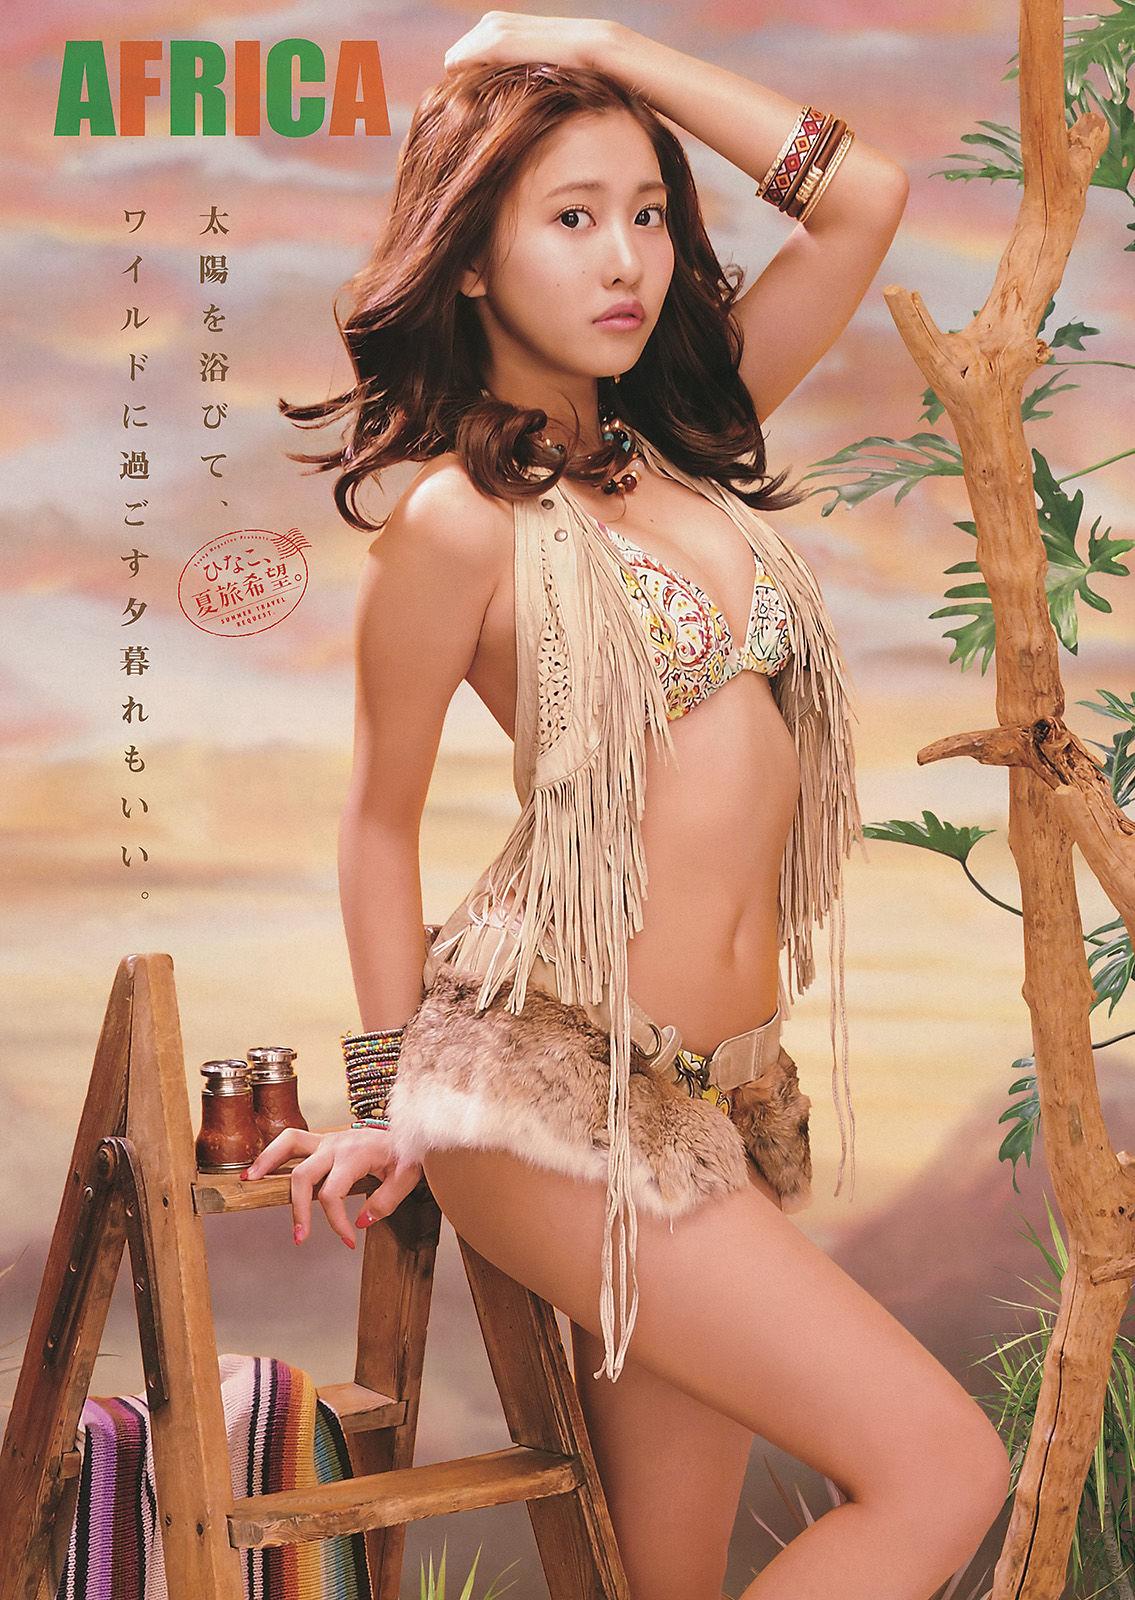 [Young Magazine杂志写真]佐野雏子超高清写真大图片(11P) 75热度